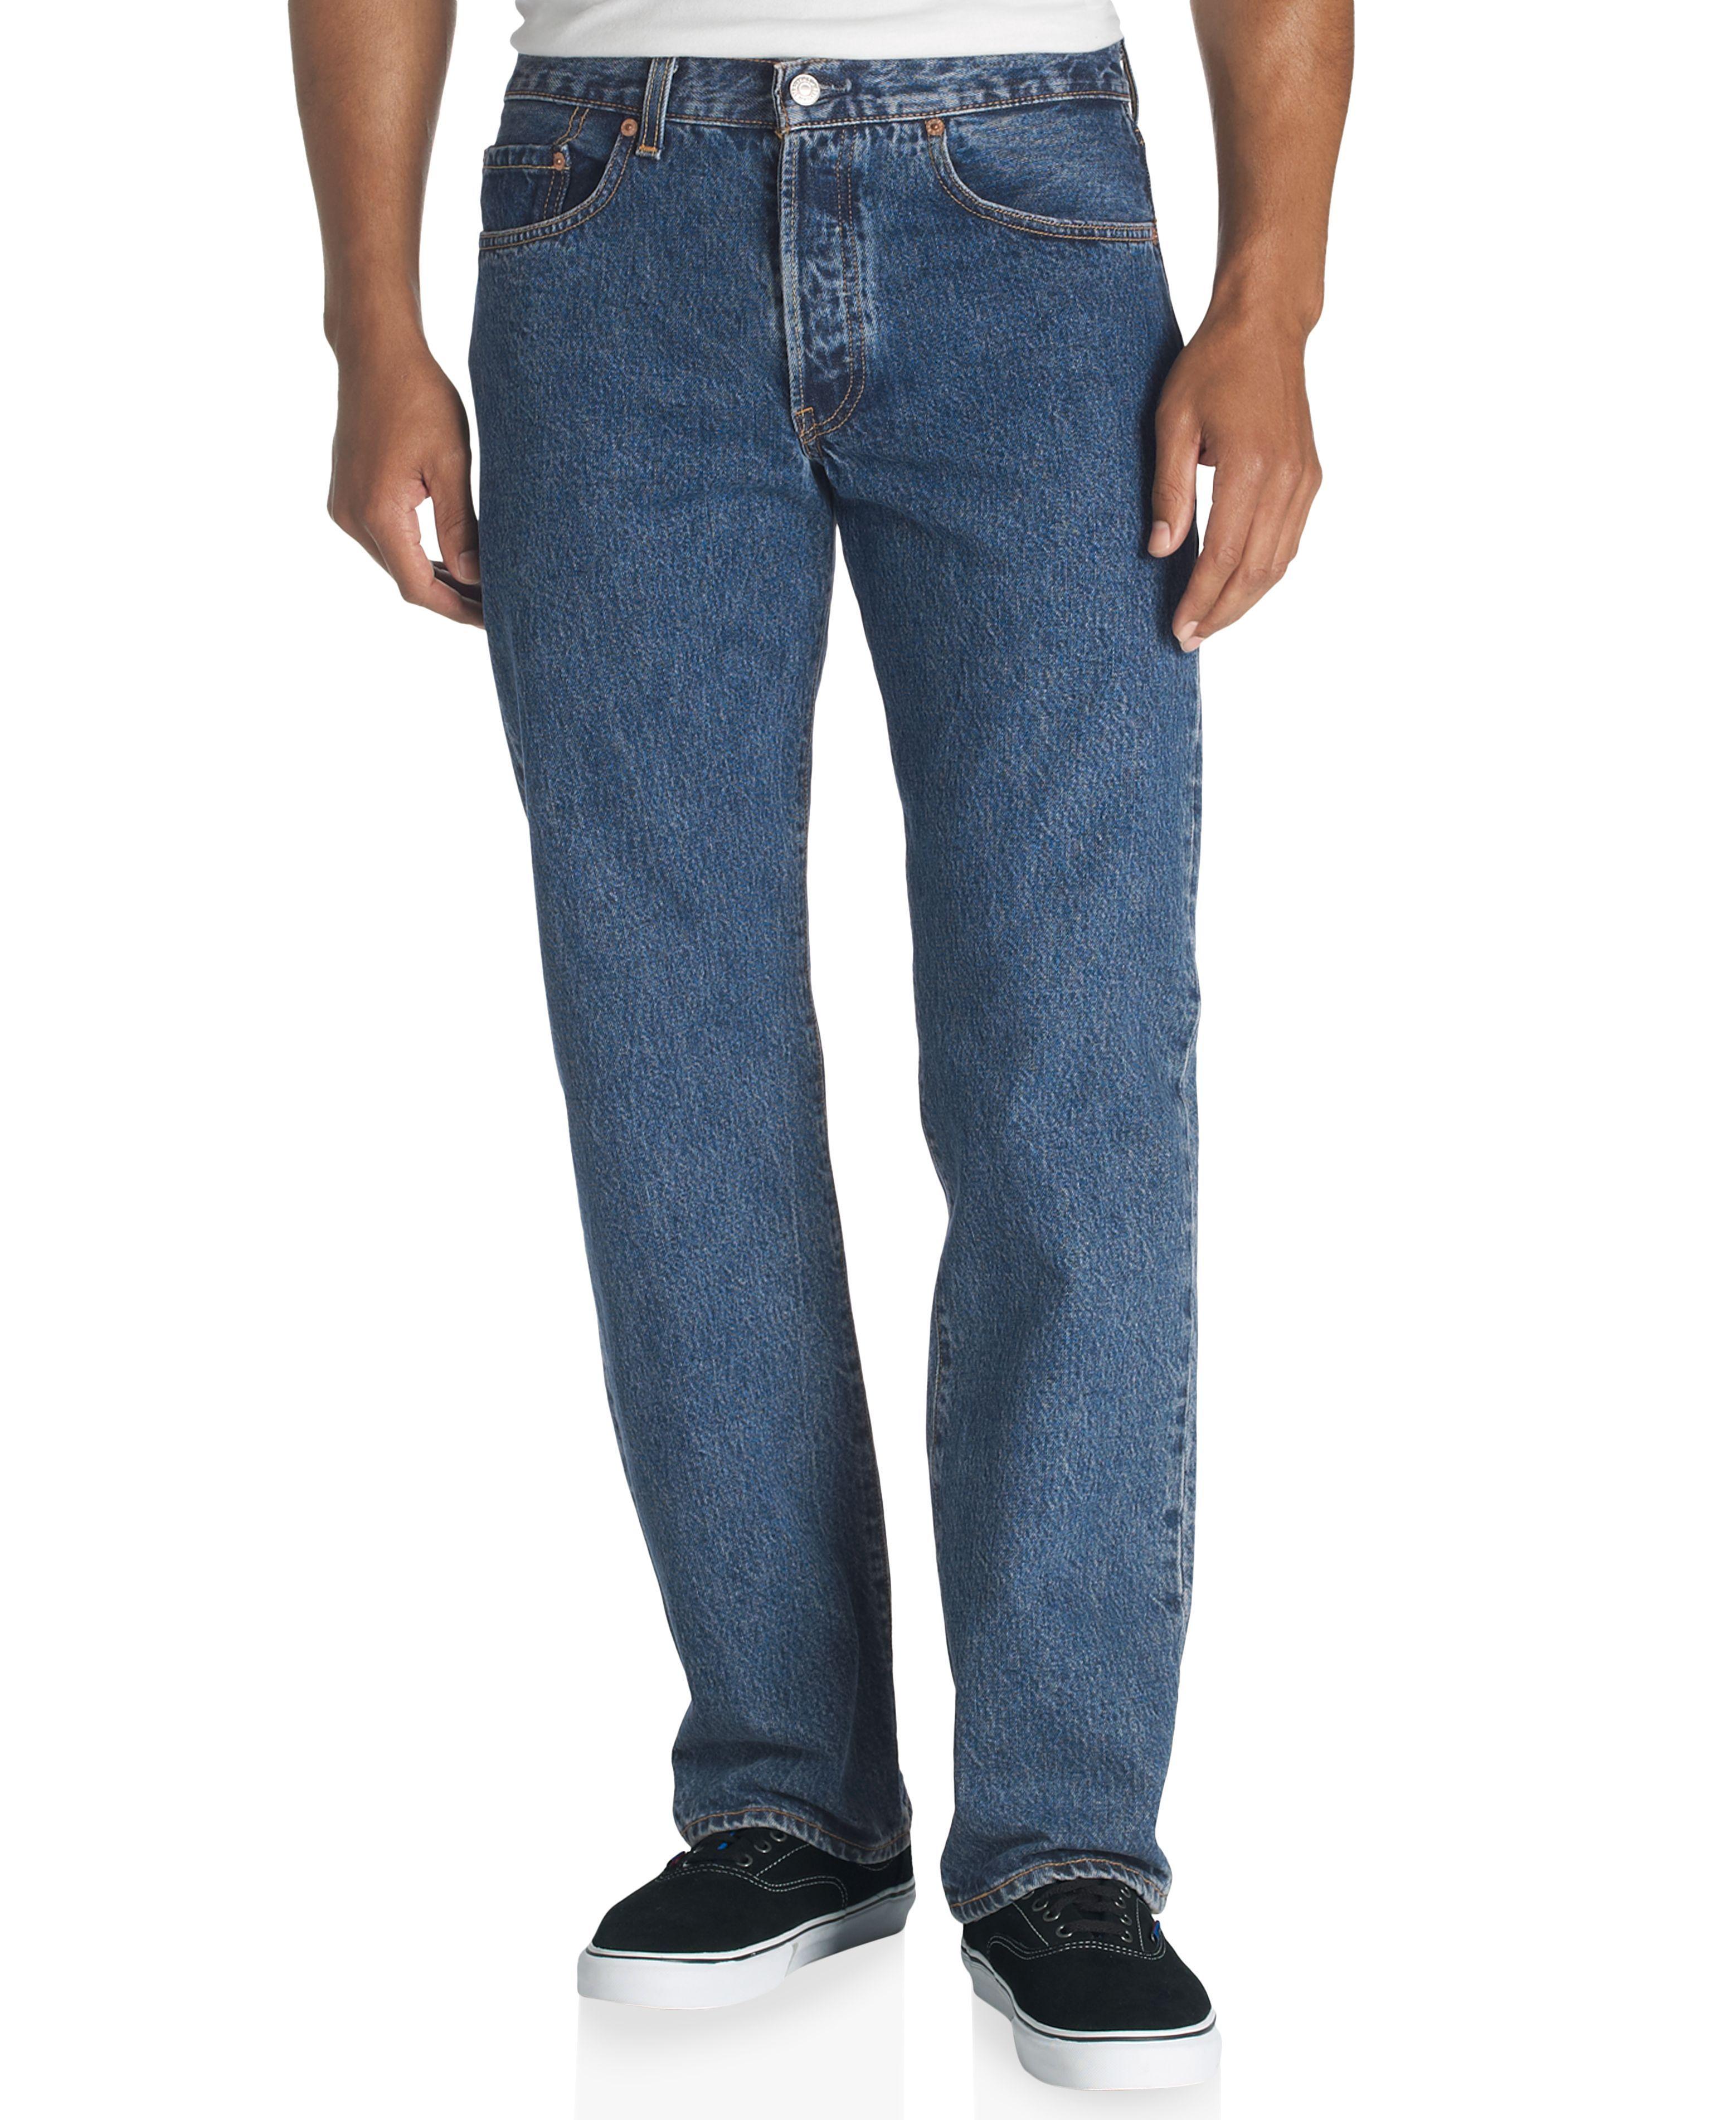 Levi's 501 Original-Fit Dark-Stonewash Jeans   Mens ...